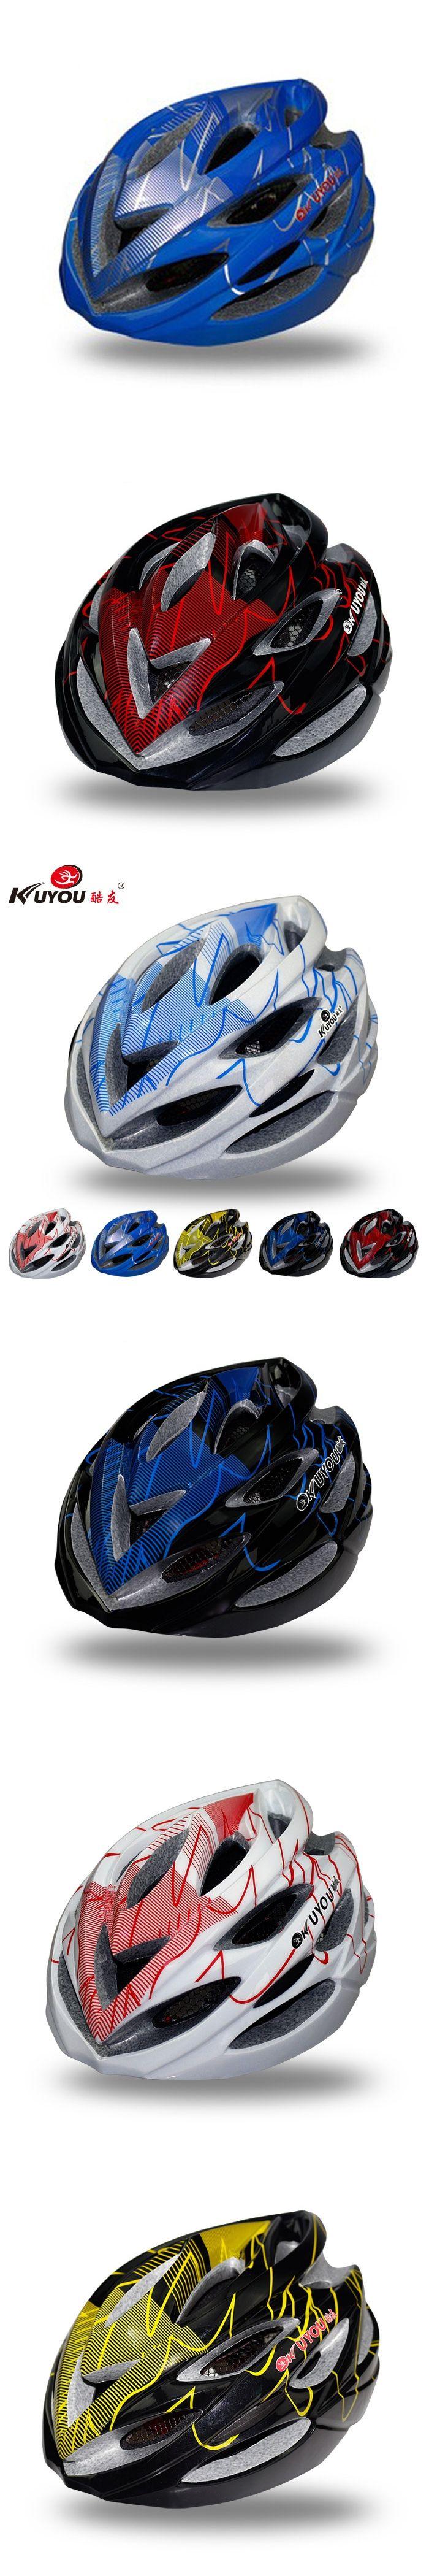 zhuoding Adult 2017  Integrally-molded  Cycling Helmet Ultralight MTB  Bicycle Helmet  Men and women Casco Ciclismo Bike Helmet